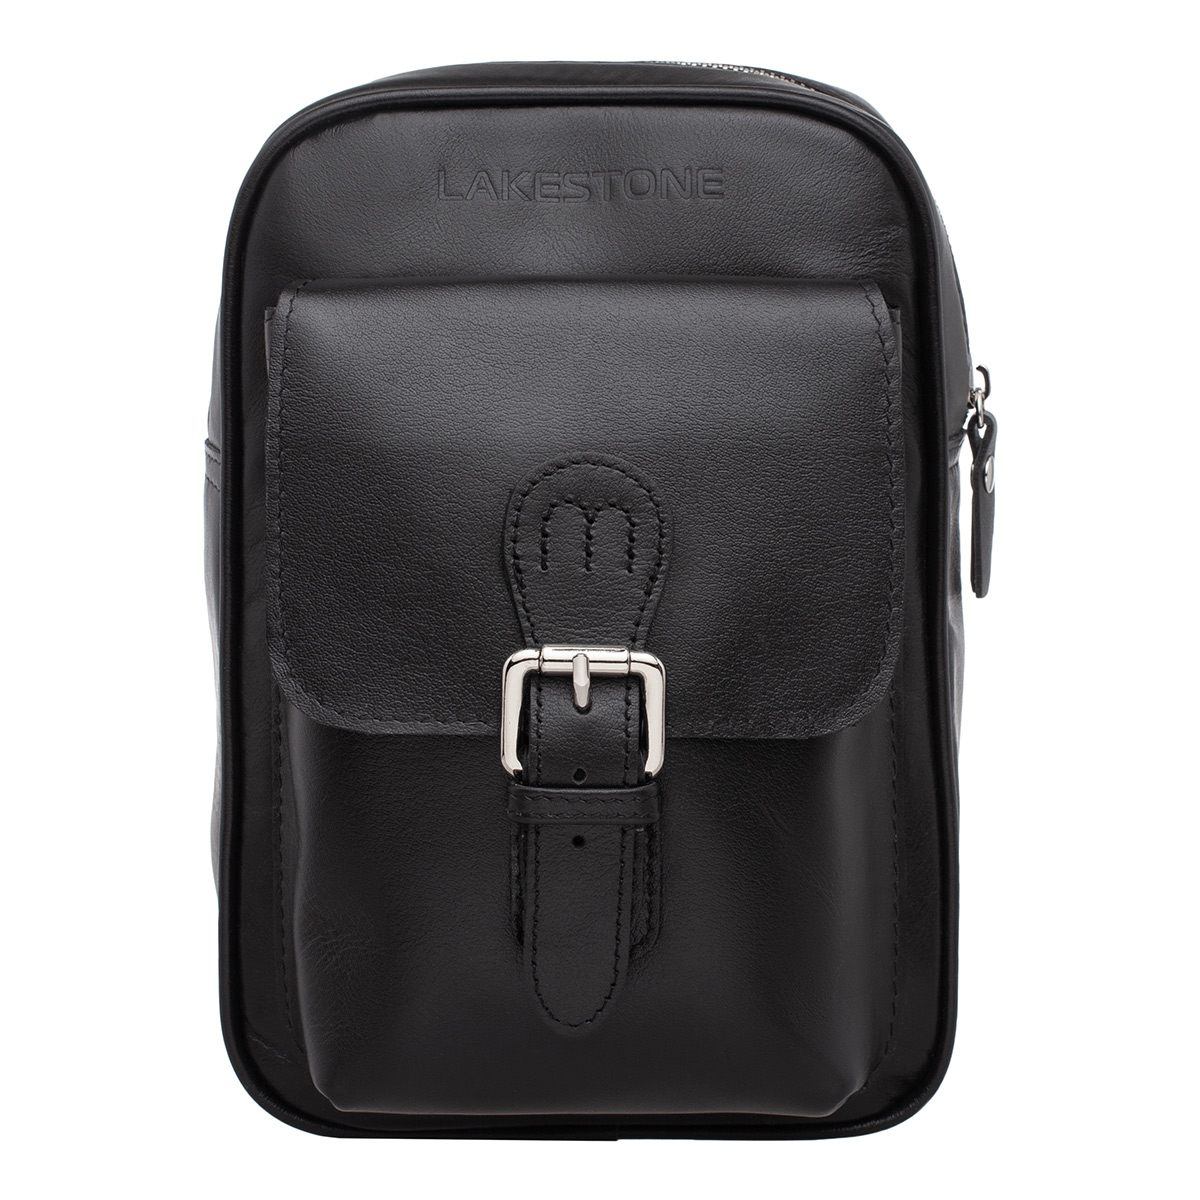 Рюкзак на одной лямке Risdale Black